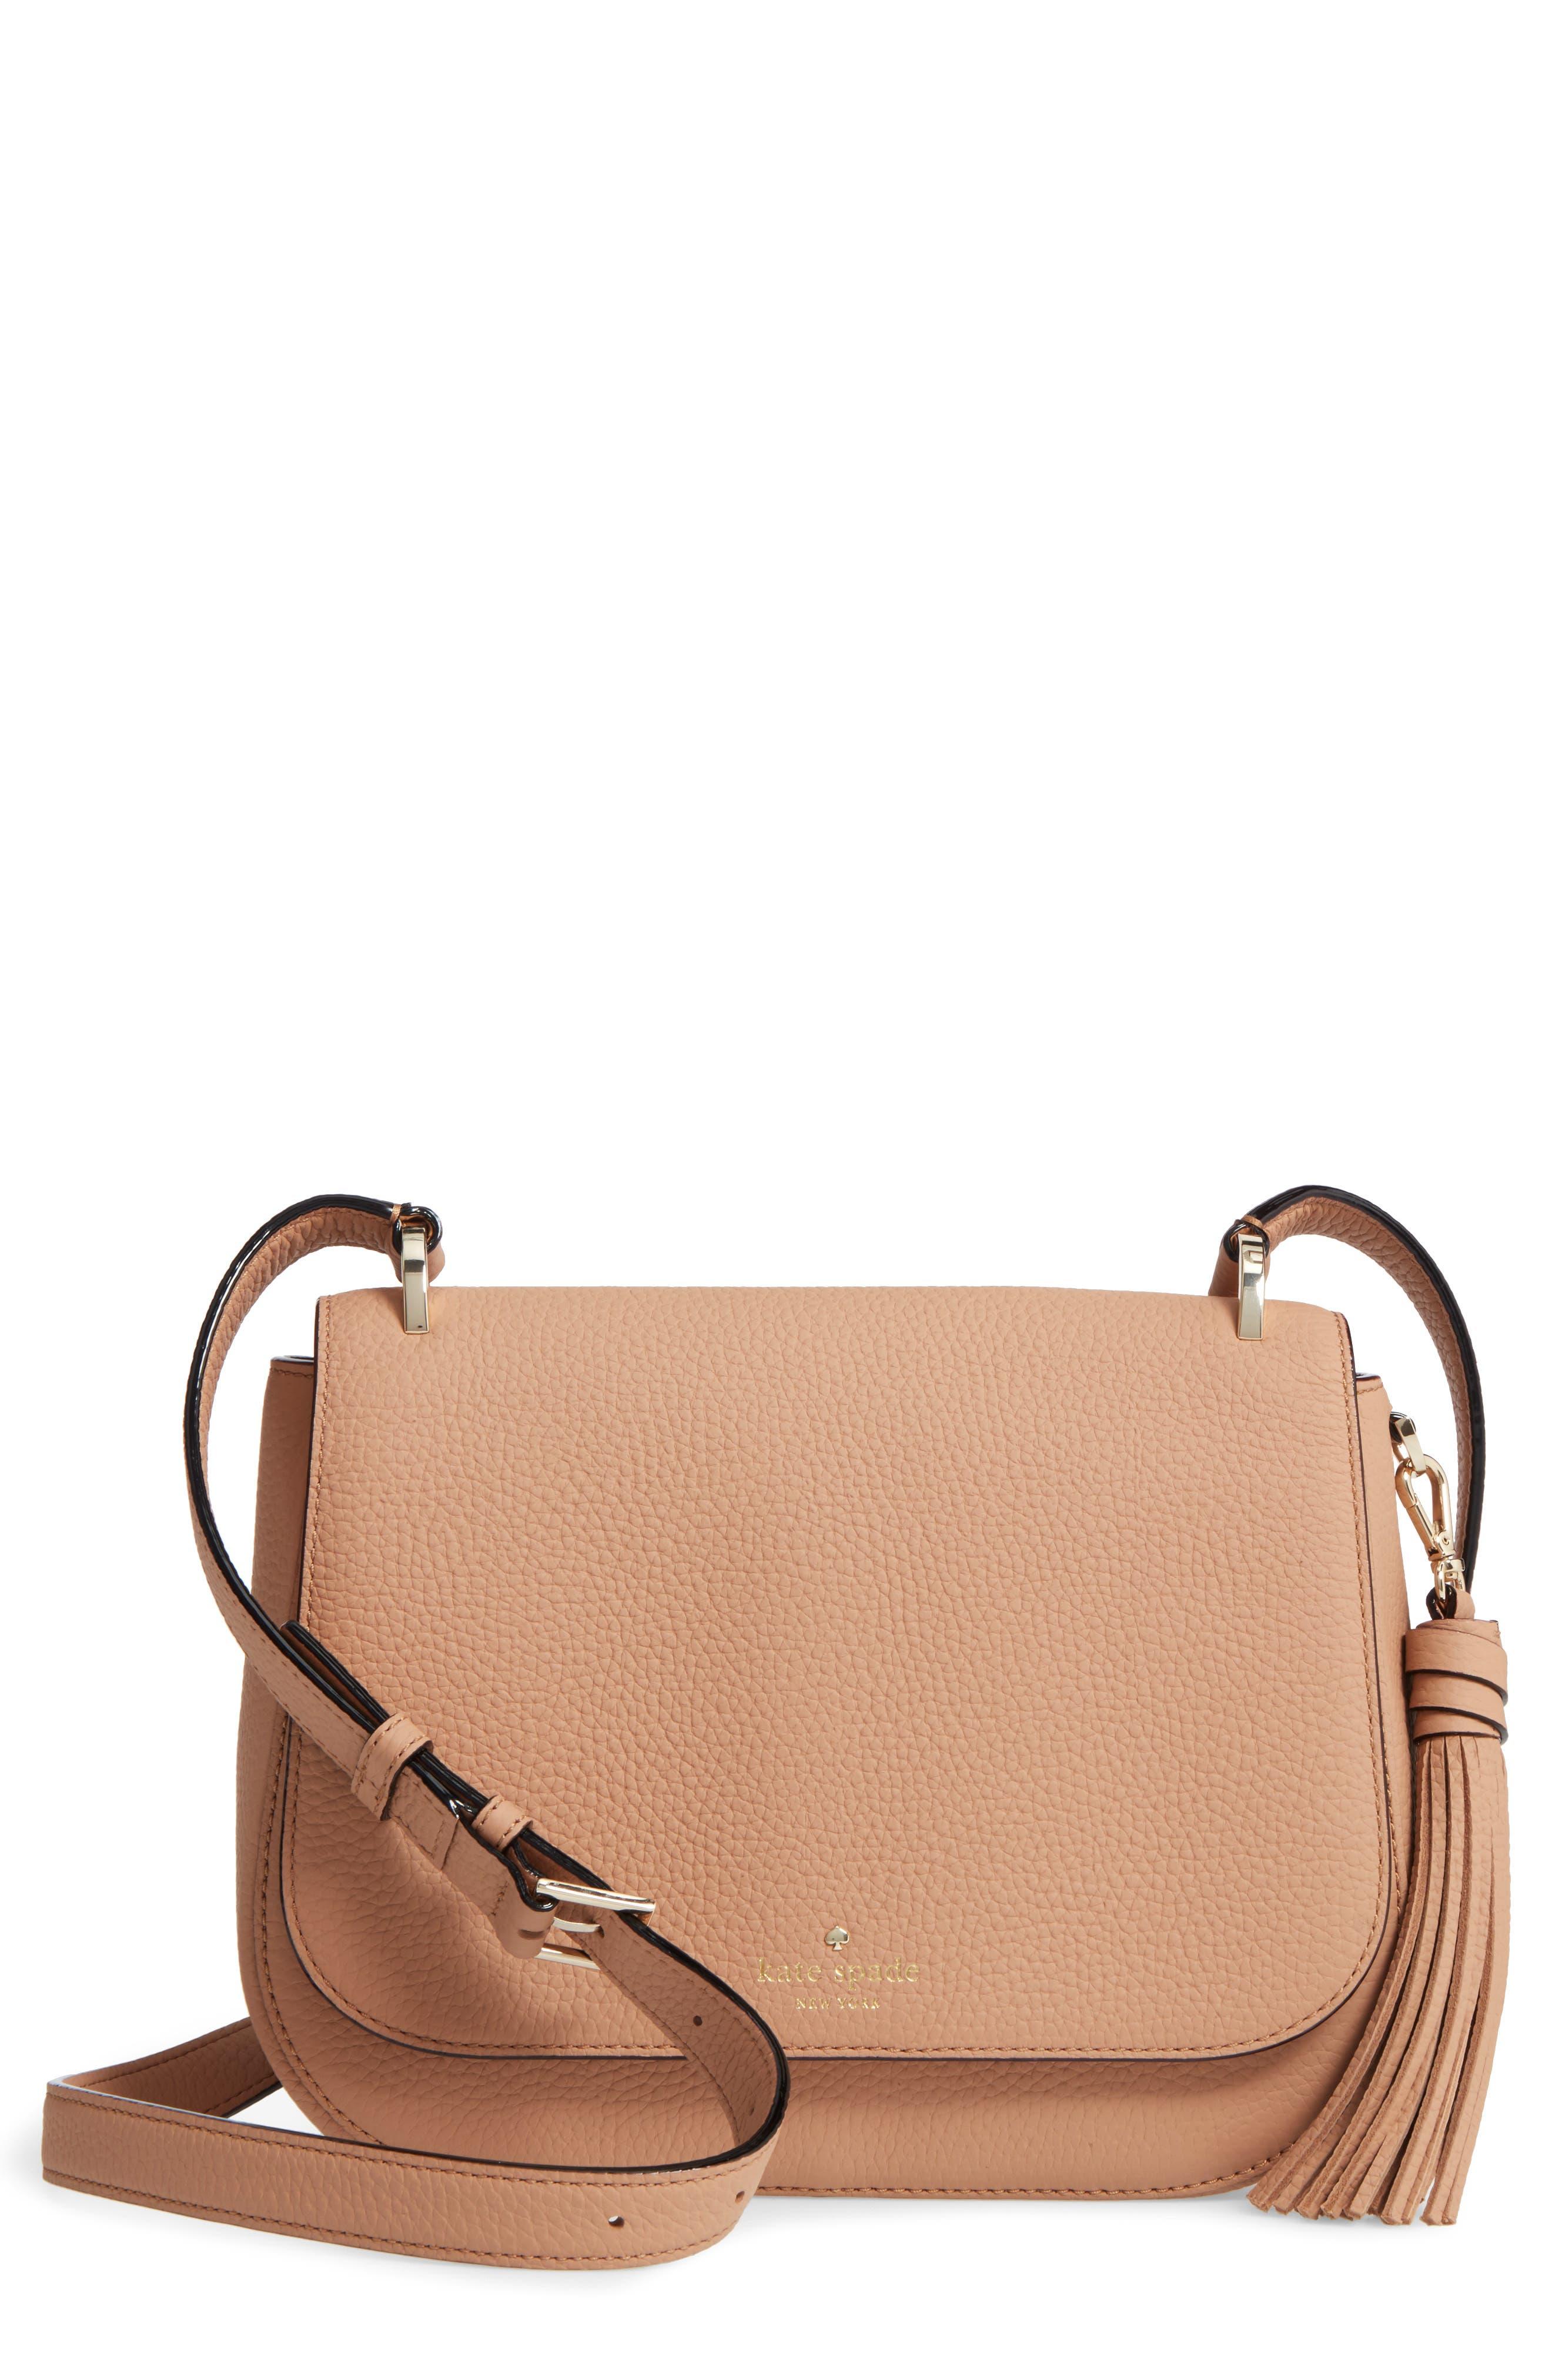 kate spade new york daniels drive - tressa leather crossbody bag